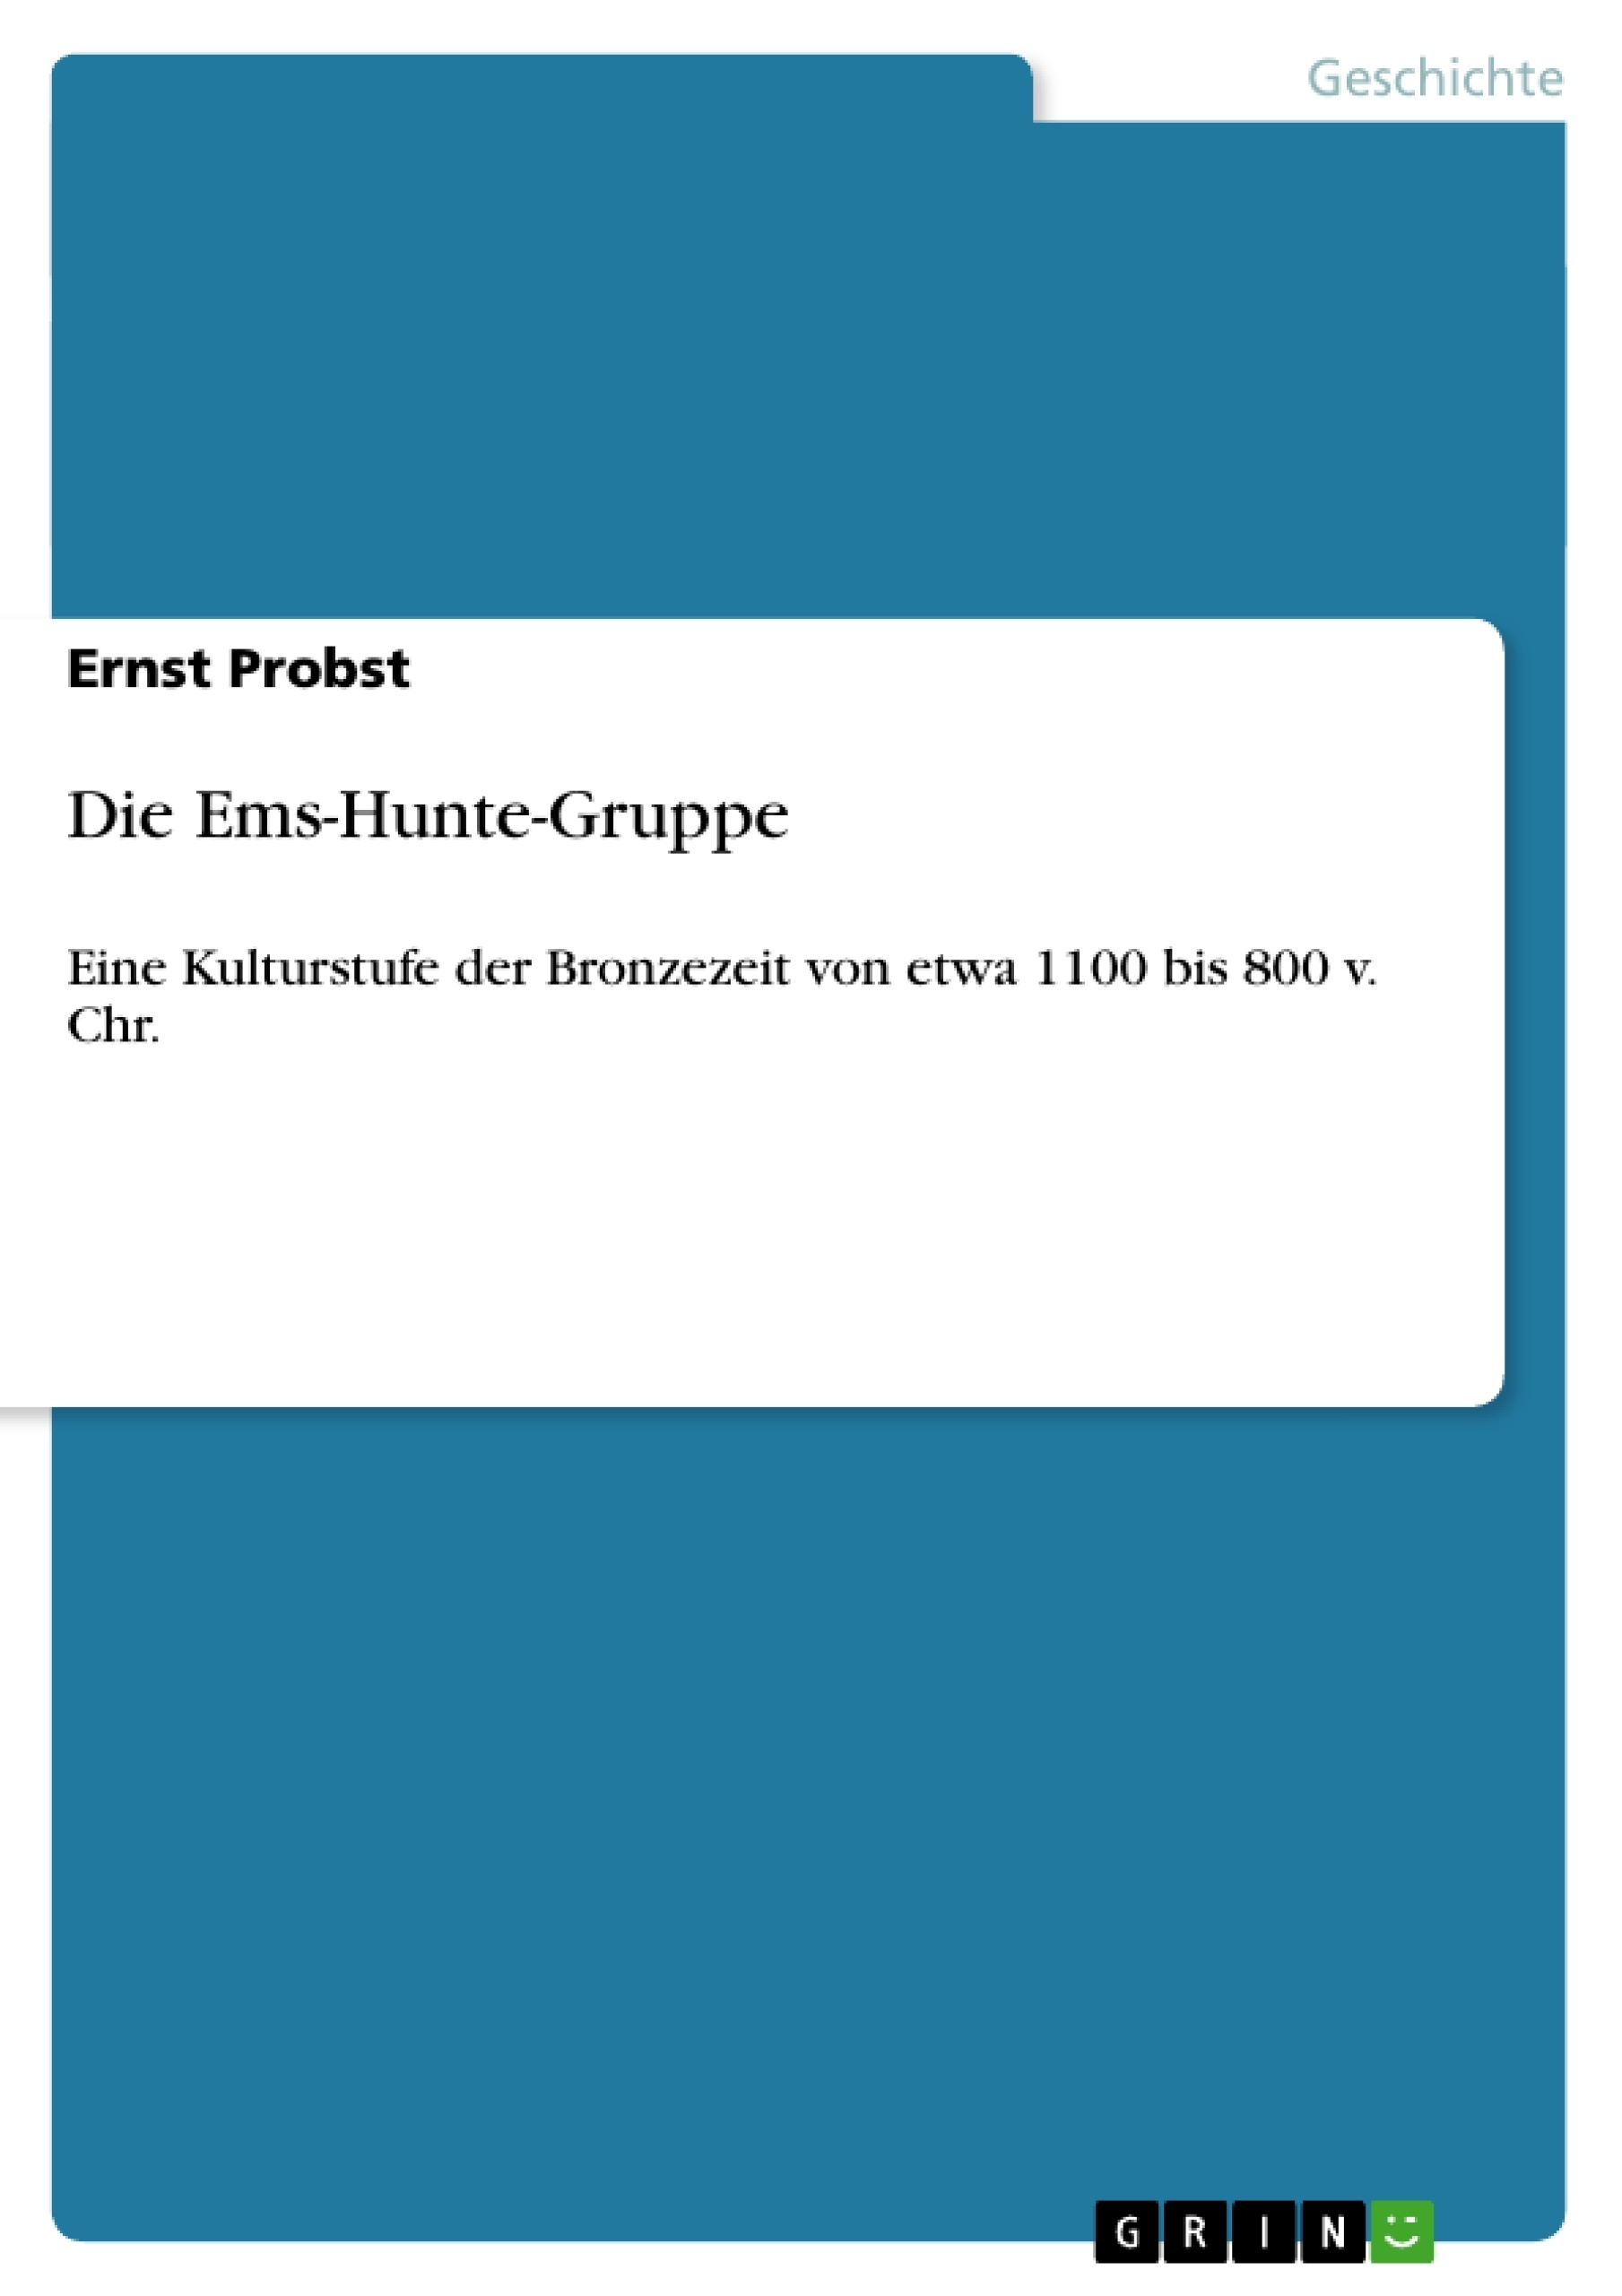 Titel: Die Ems-Hunte-Gruppe